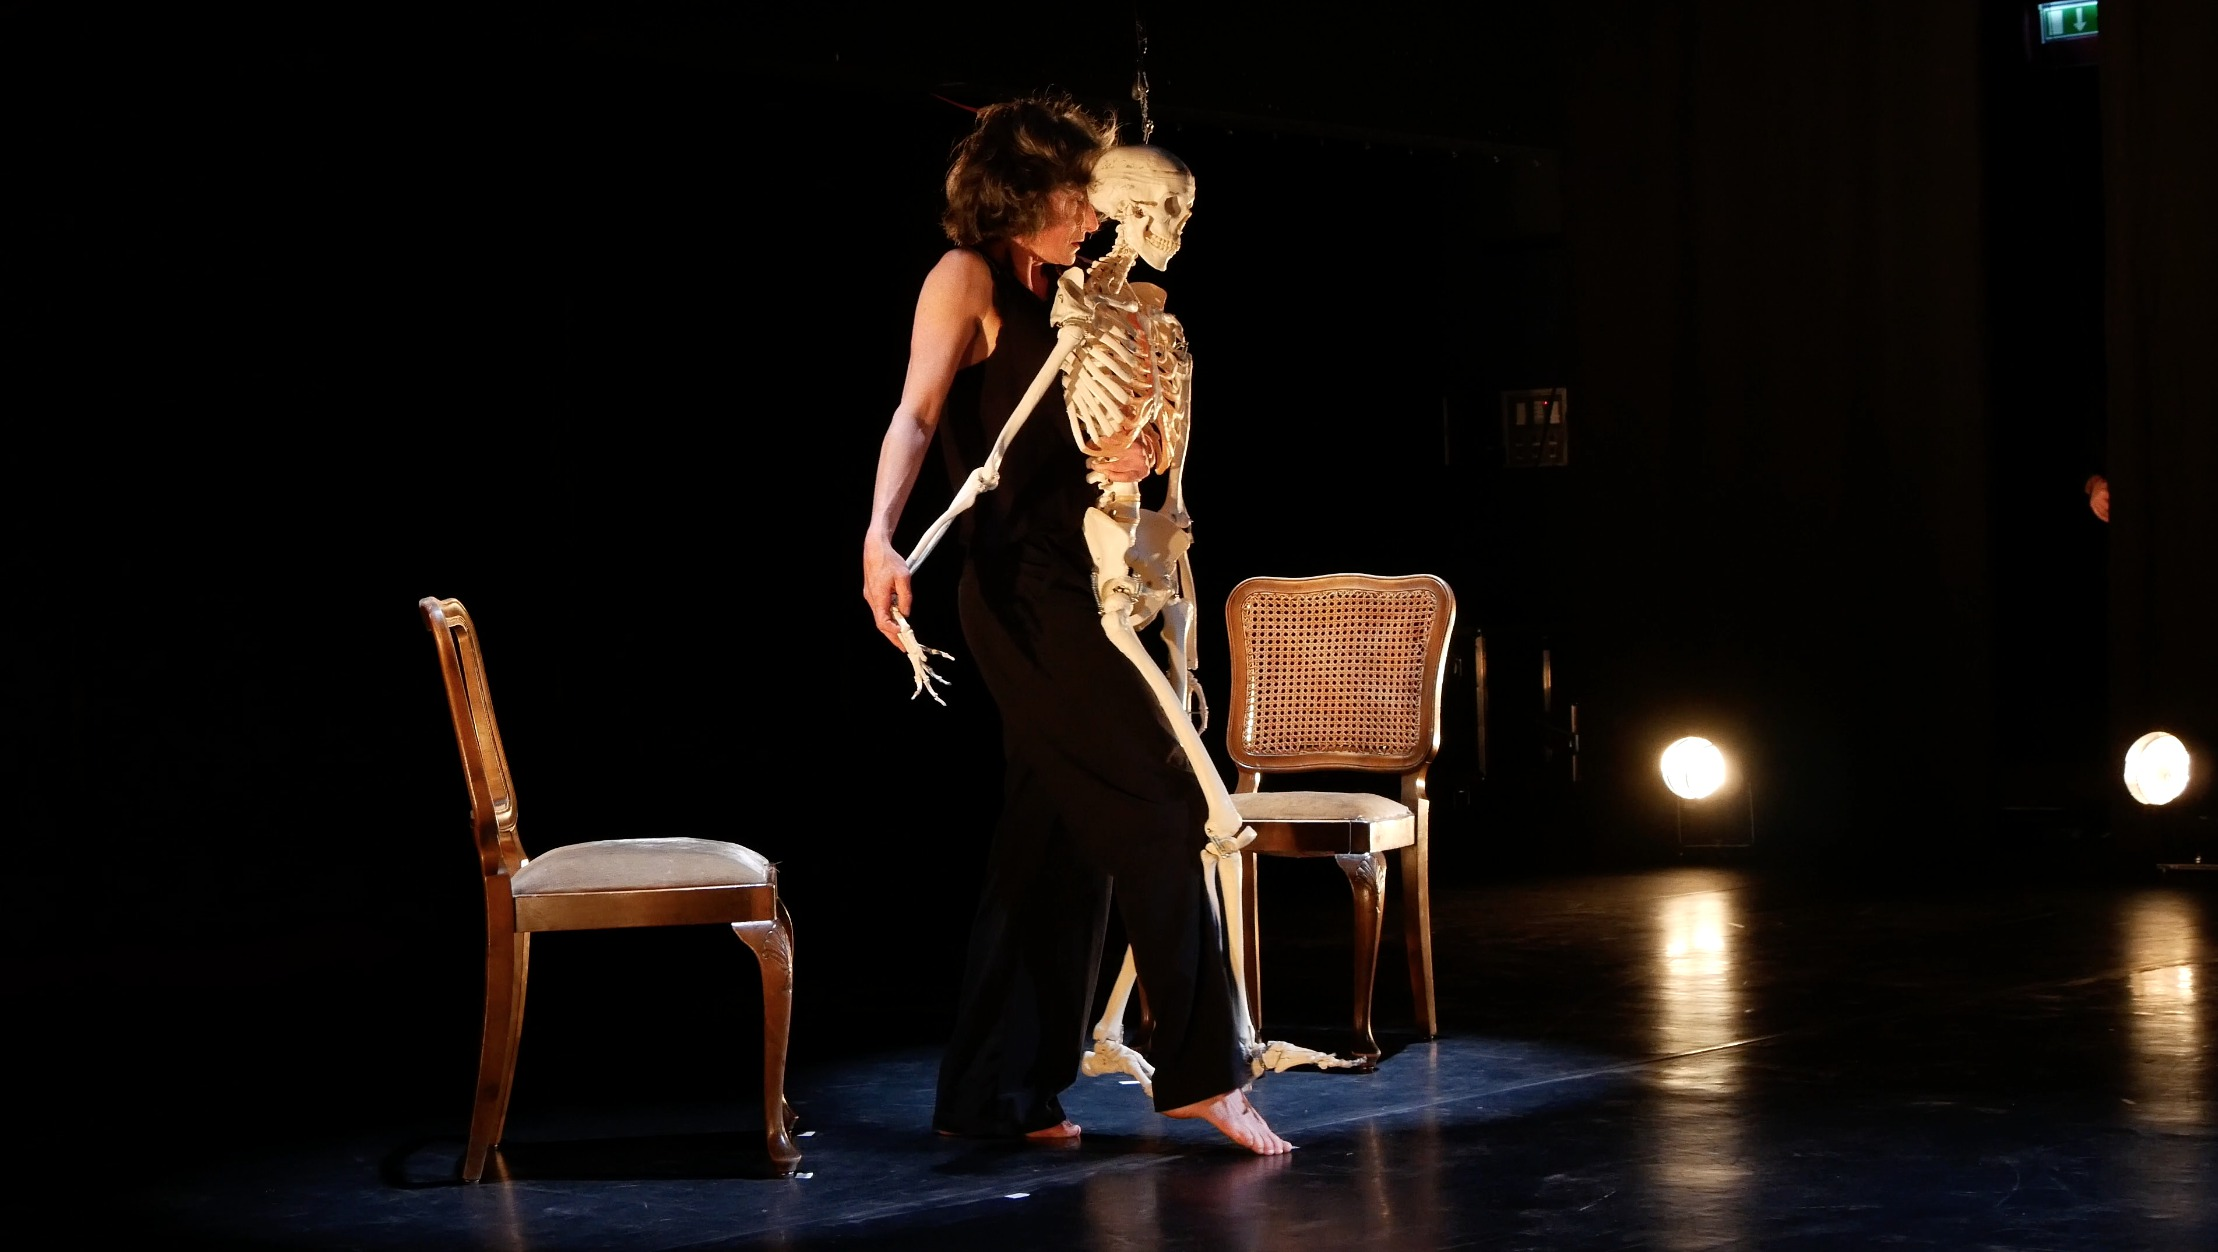 Danse macabre - Dein Femur singt - Chrystel Guillebeaud